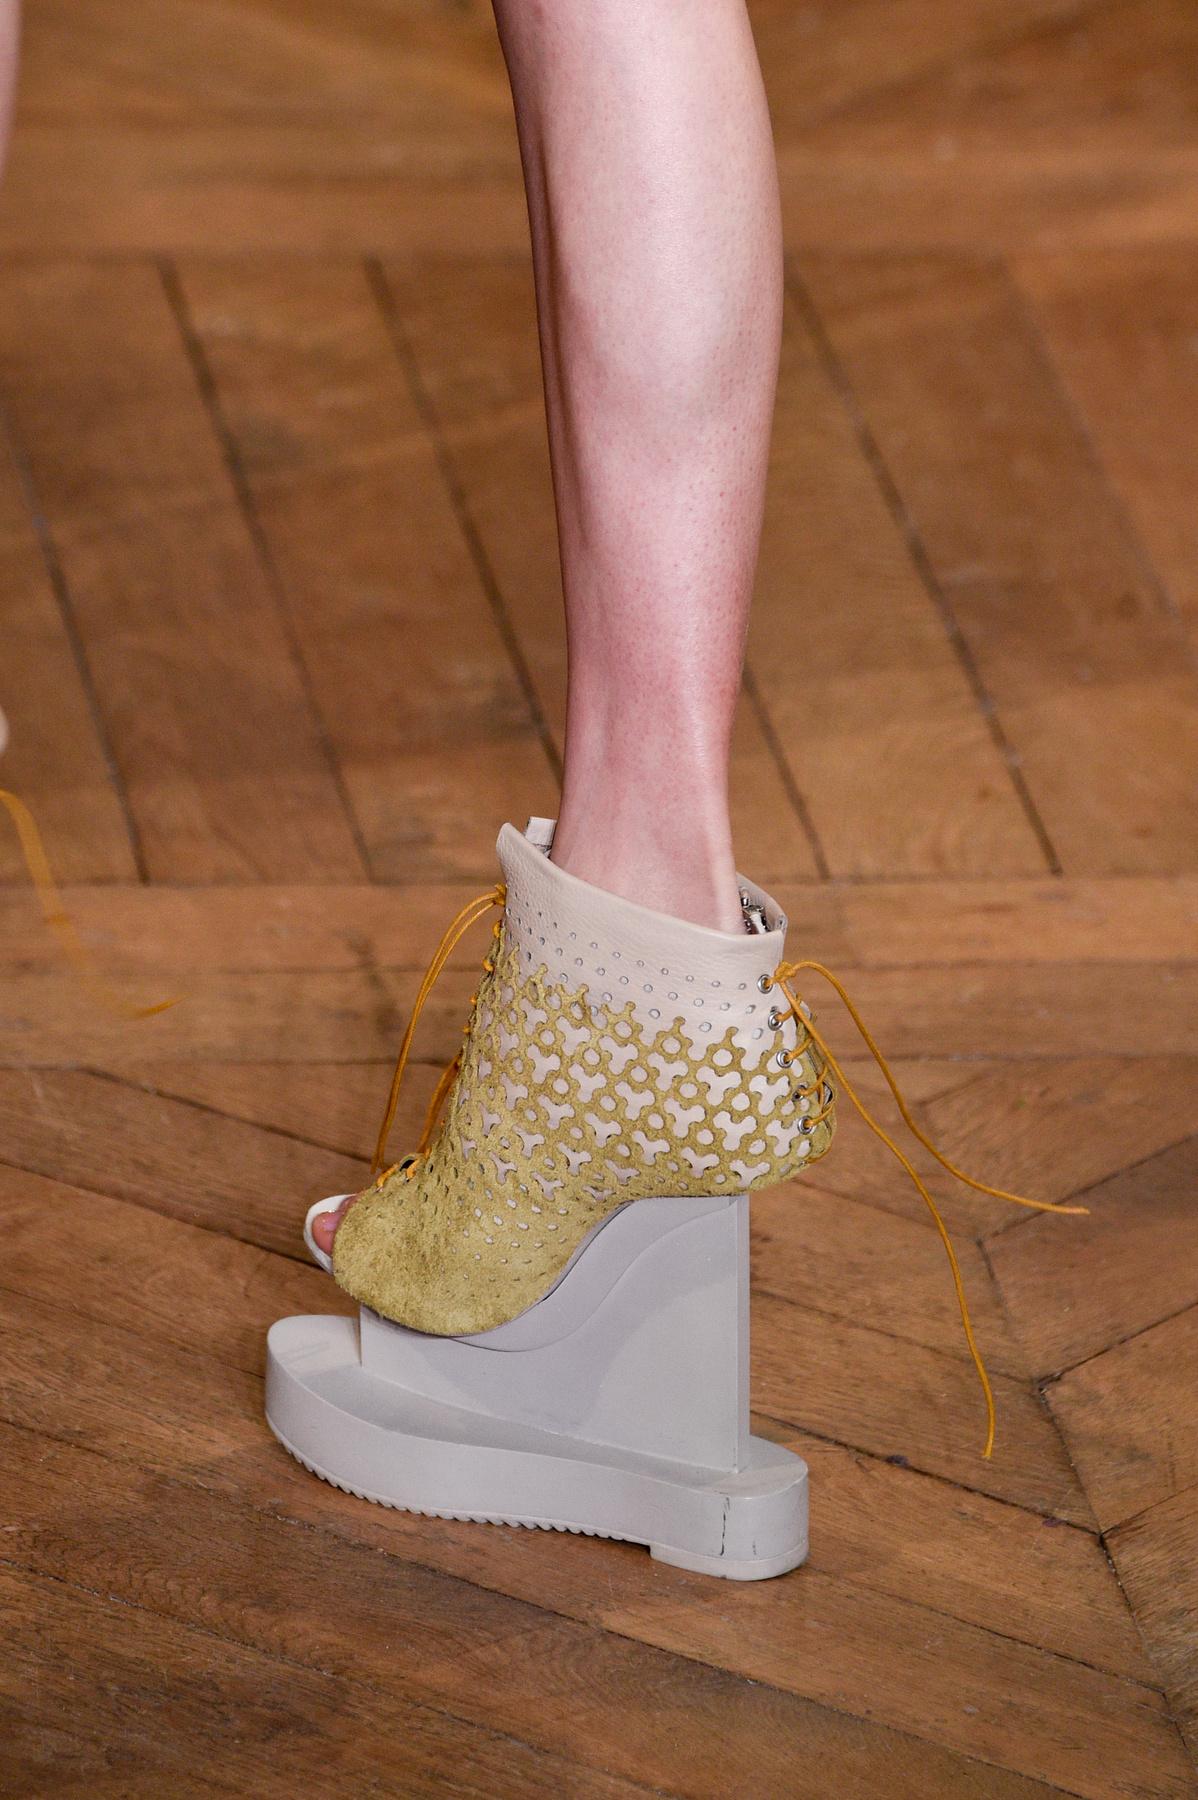 Iris Van Herpen is megreformálná a cipő piacot.